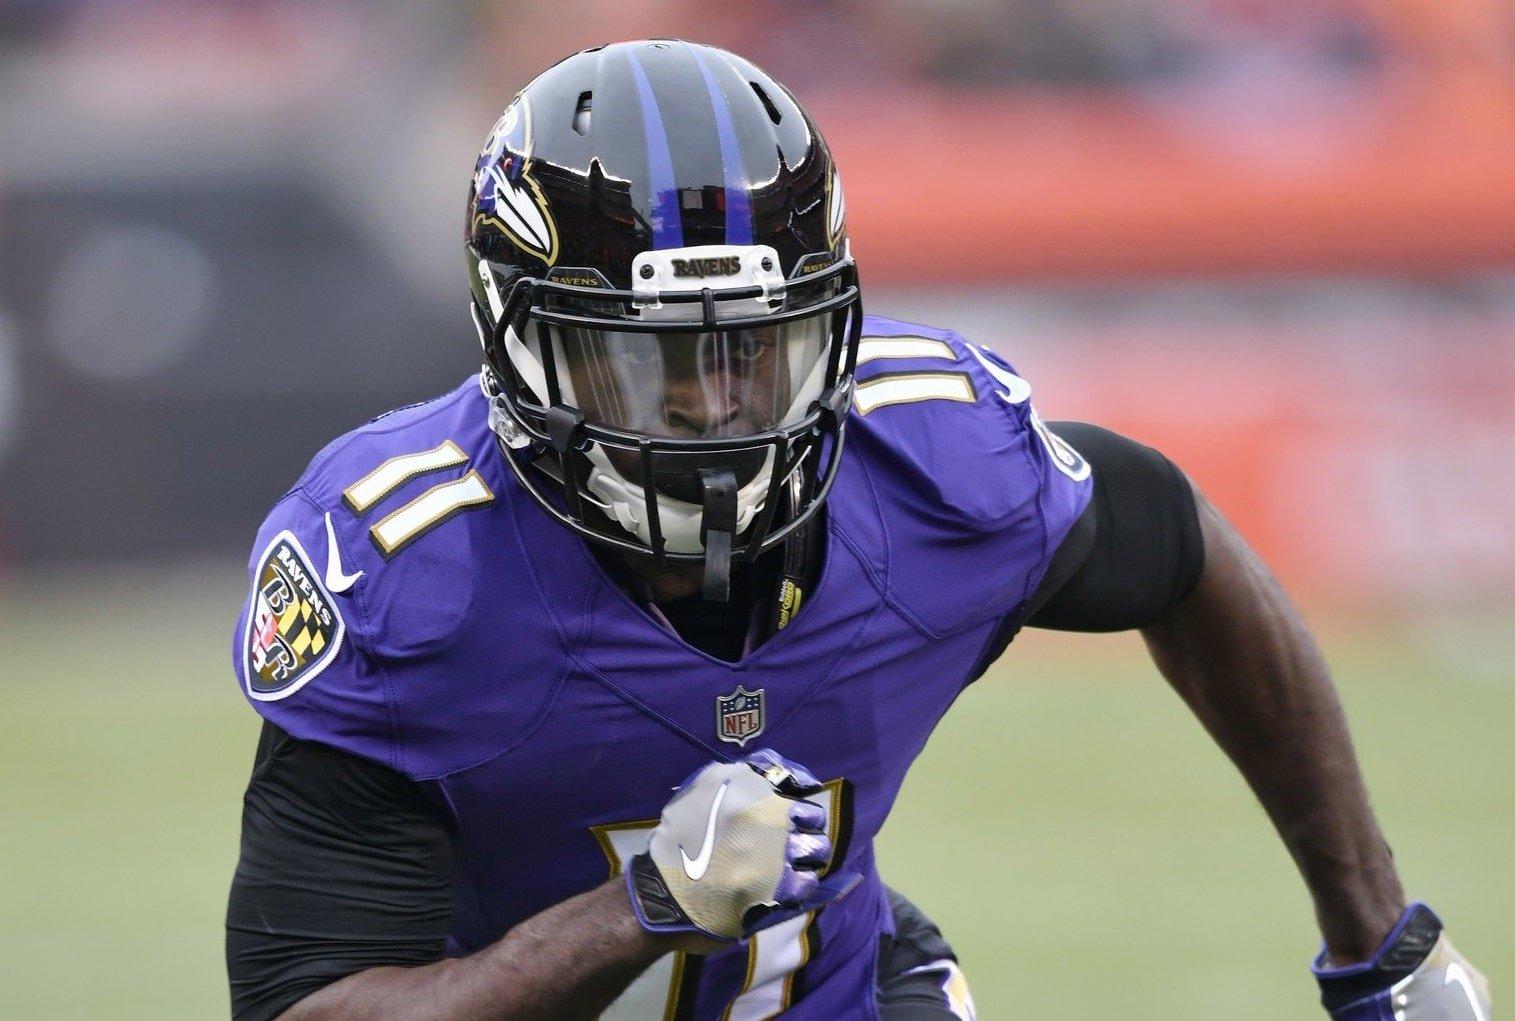 Breshad Perriman, wide receiver do Baltimore Ravens